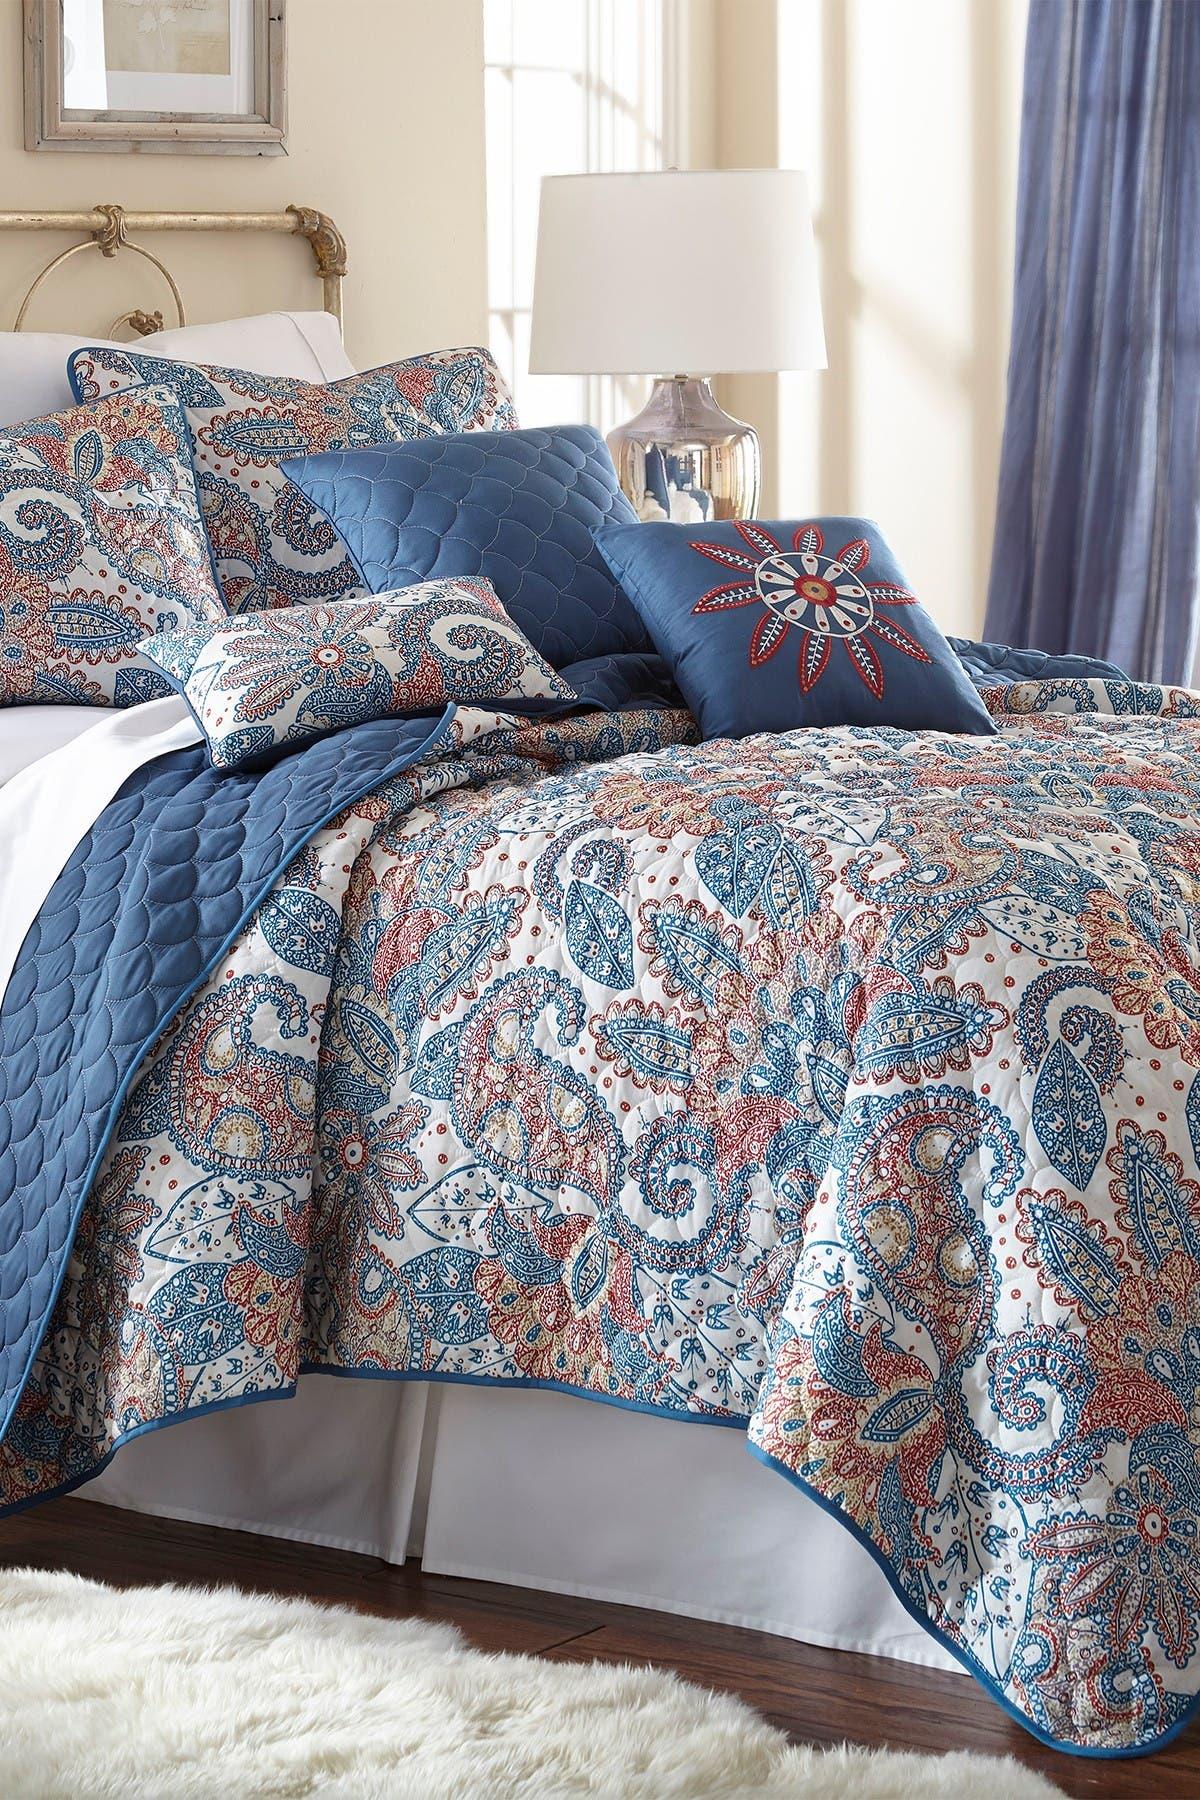 Image of Modern Threads Queen Arcadia Reversible Quilt Set - Arcadia